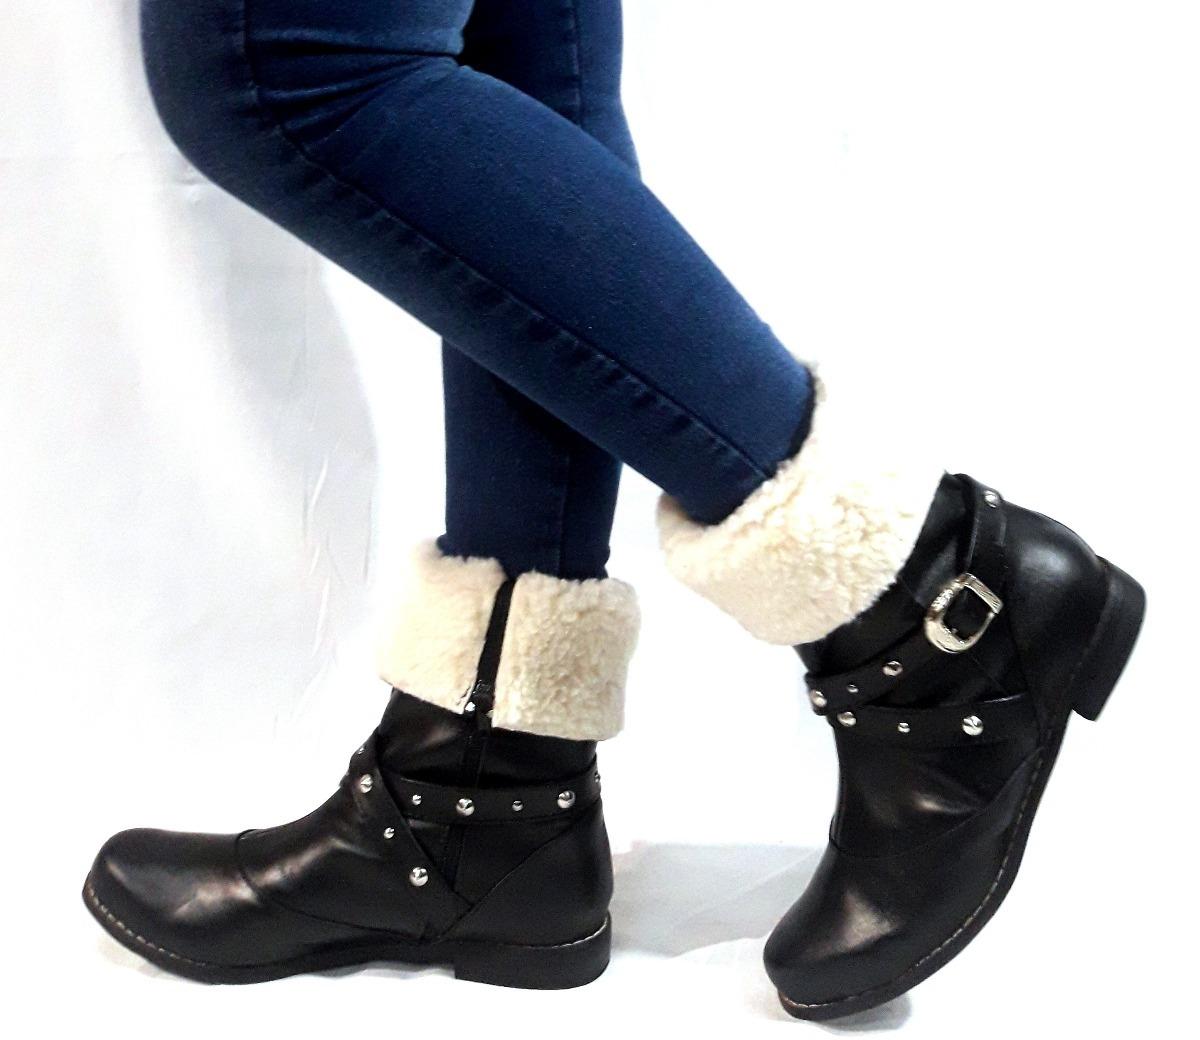 300aa11a58 sam123 botas cortas mujer talle grande cuotas 016cor negras. Cargando zoom.